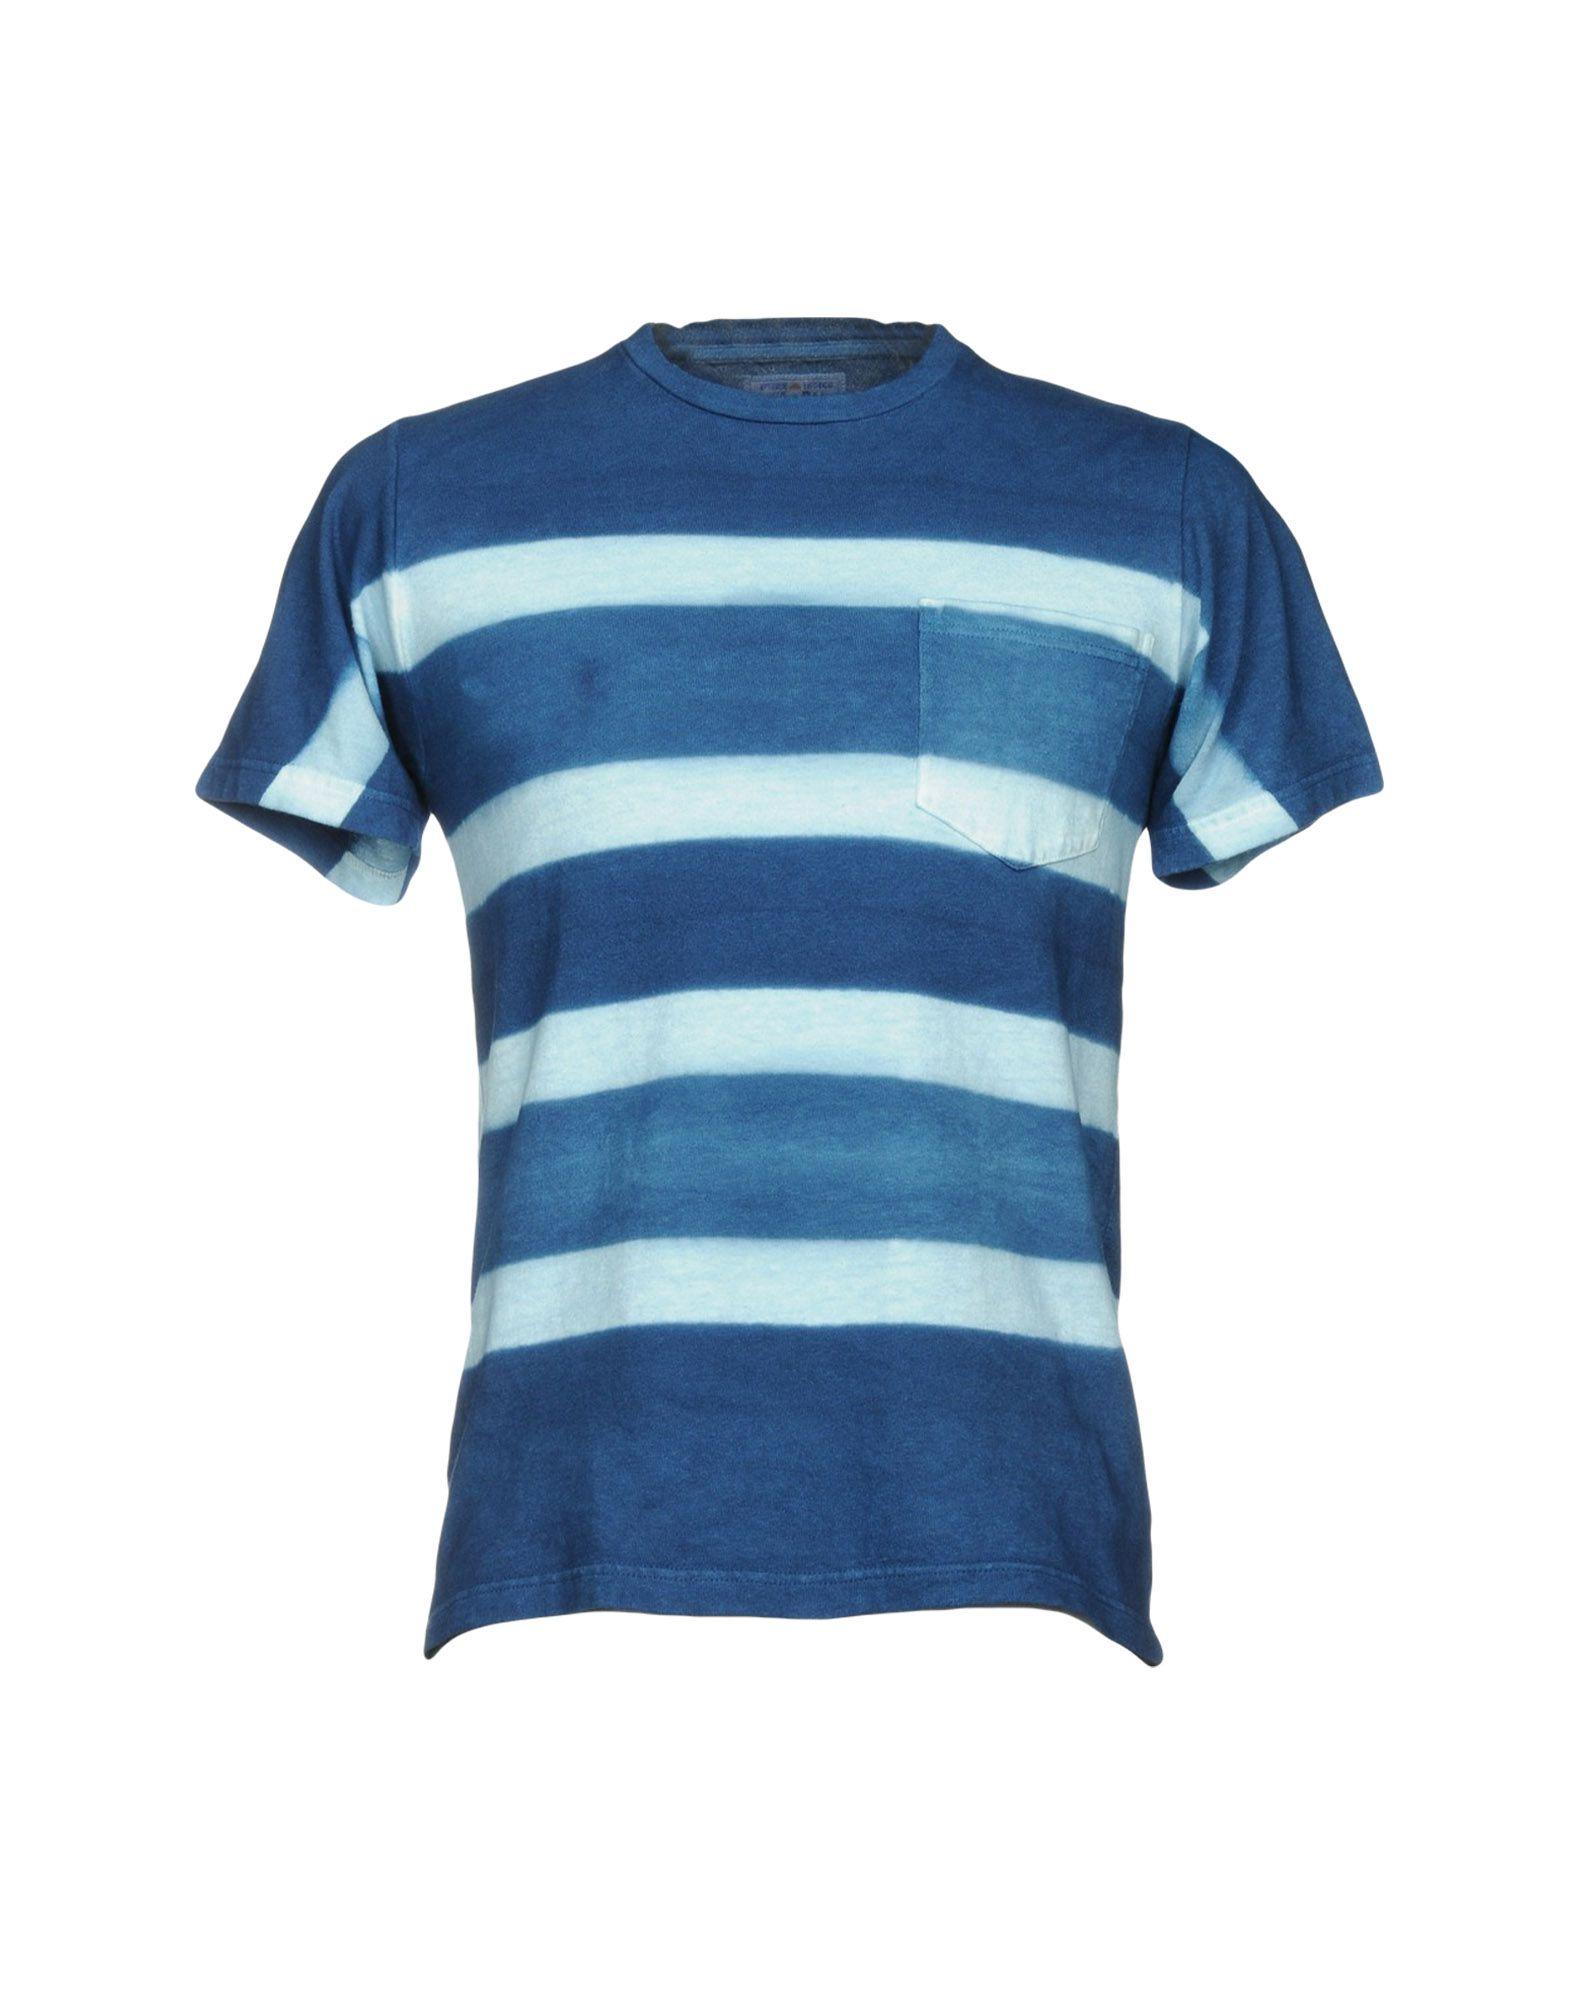 T-Shirt Blue Blue  Japan Uomo - Acquista online su